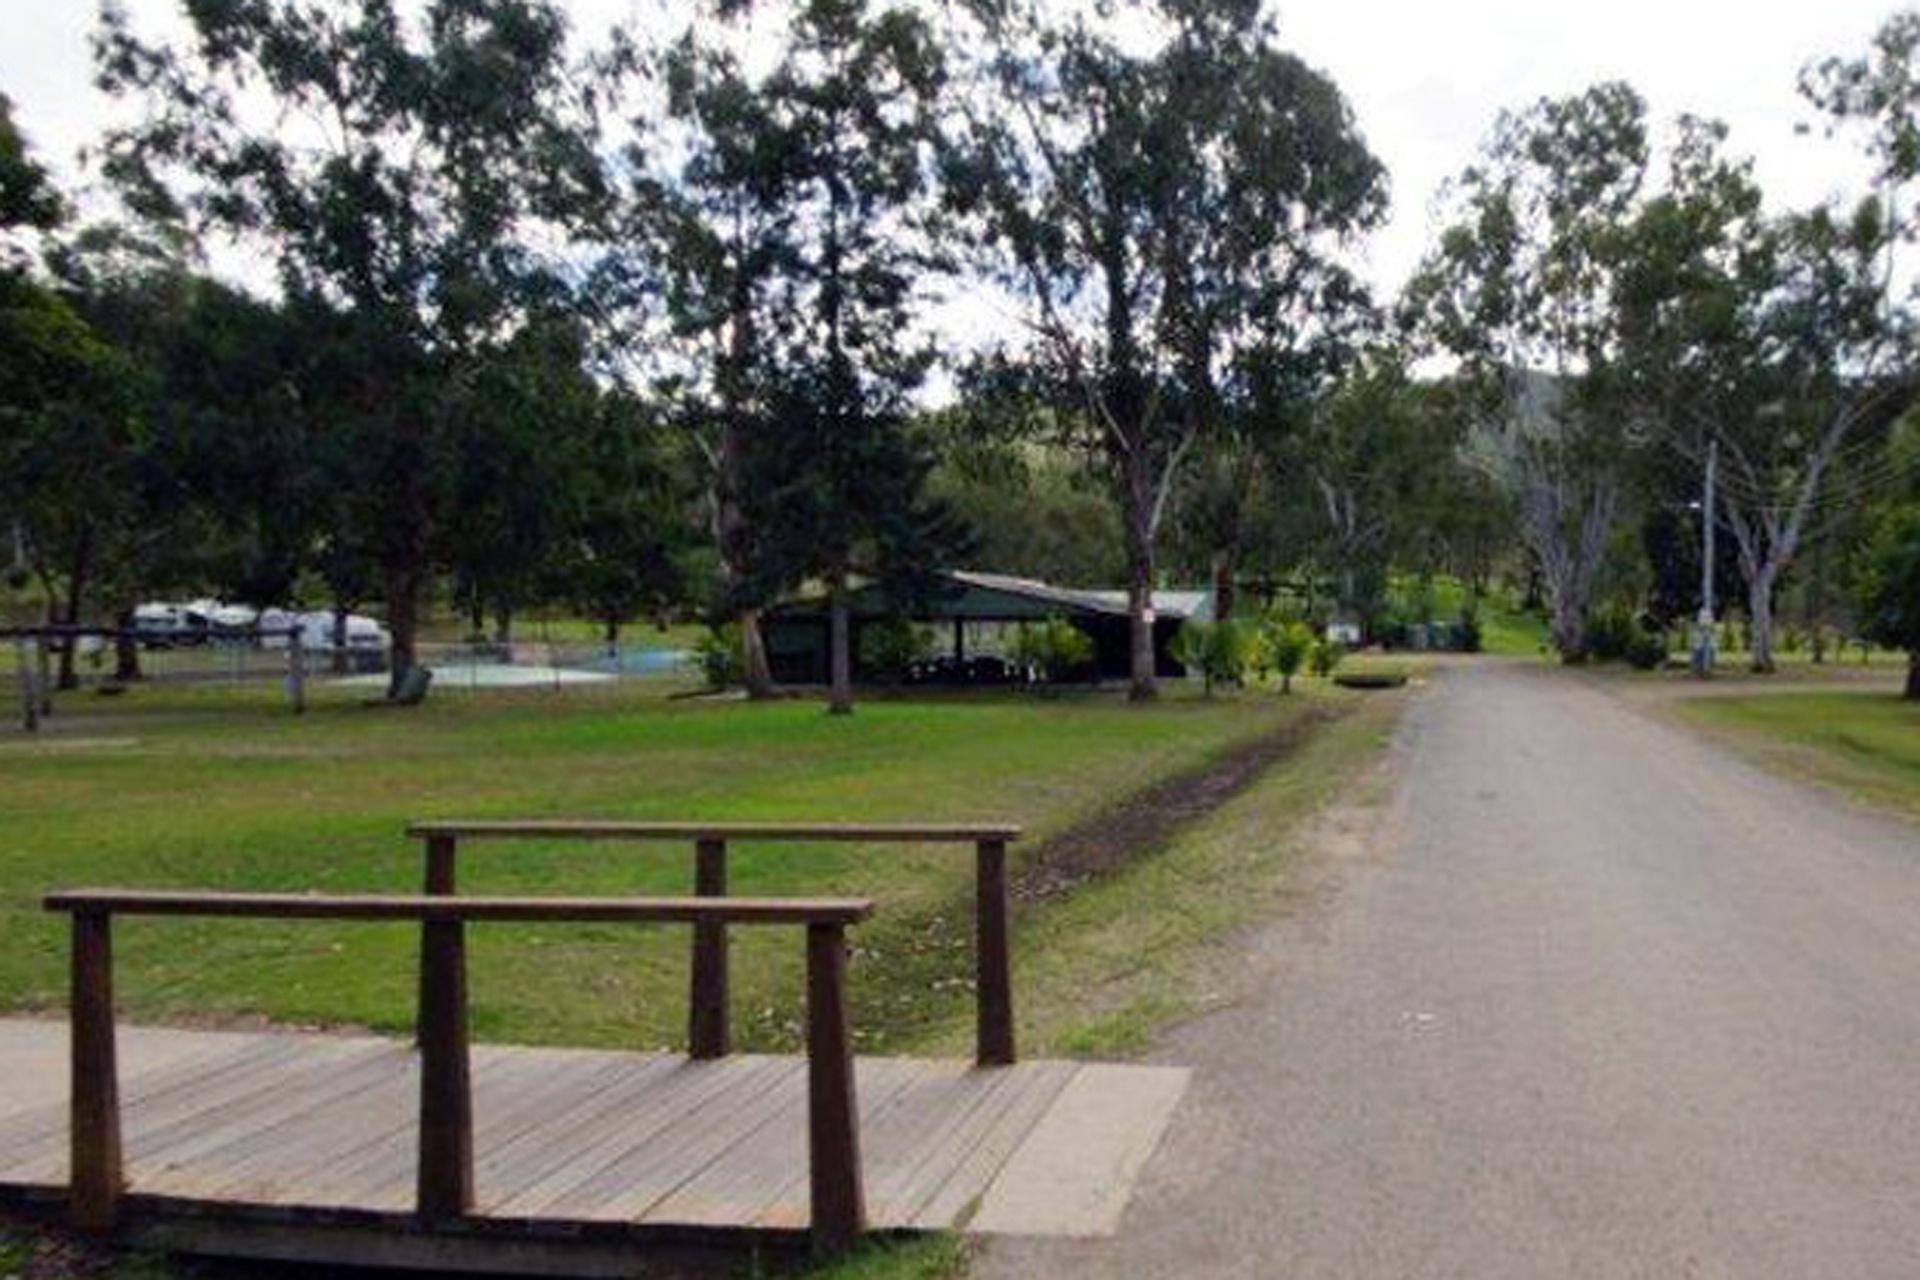 e - Cania Gorge Caravan & Tourist Park